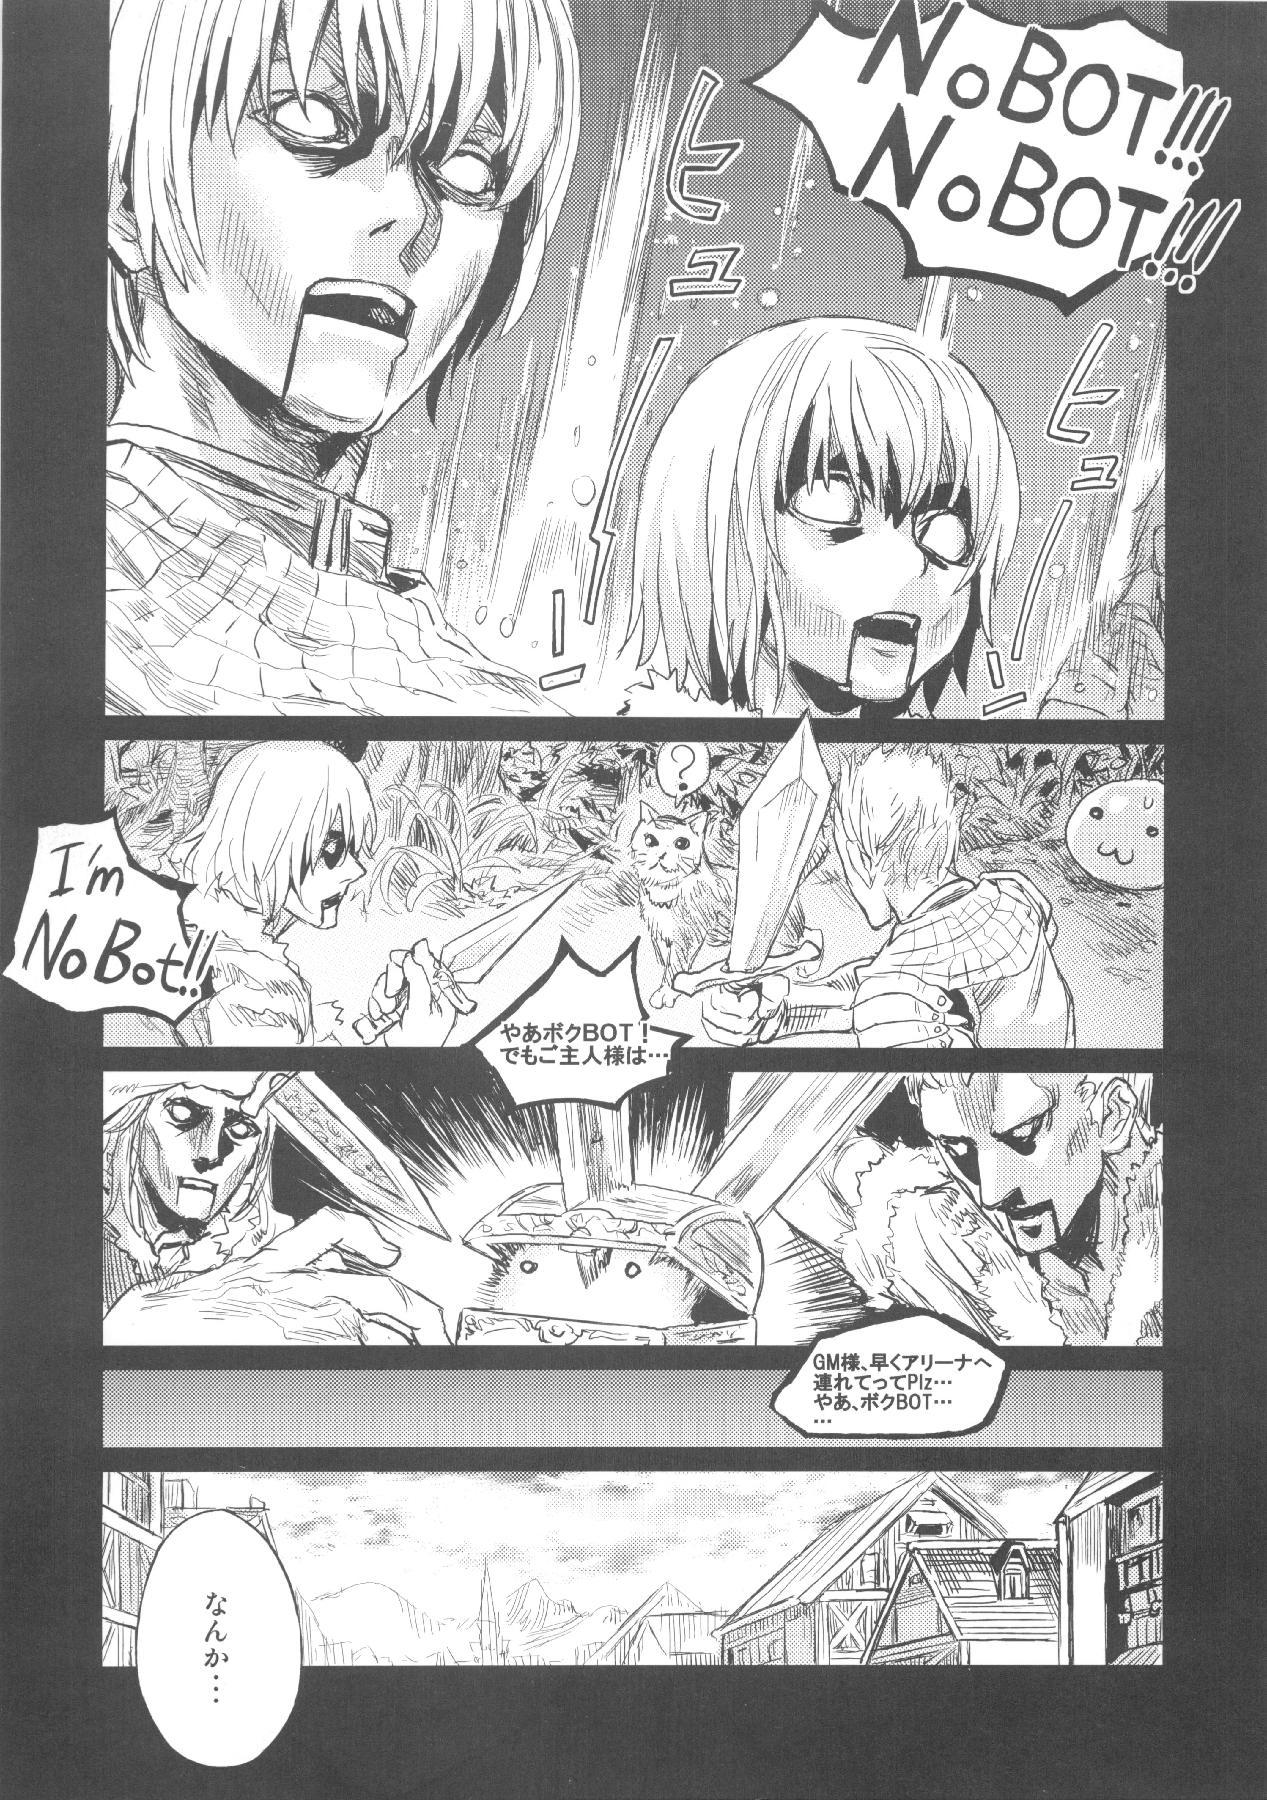 (C83) [Fatalpulse (Asanagi)] VictimGirls Compiled Vol.1 -Victimgirls Soushuuhen 1- MMO Game Selection (Various) 9